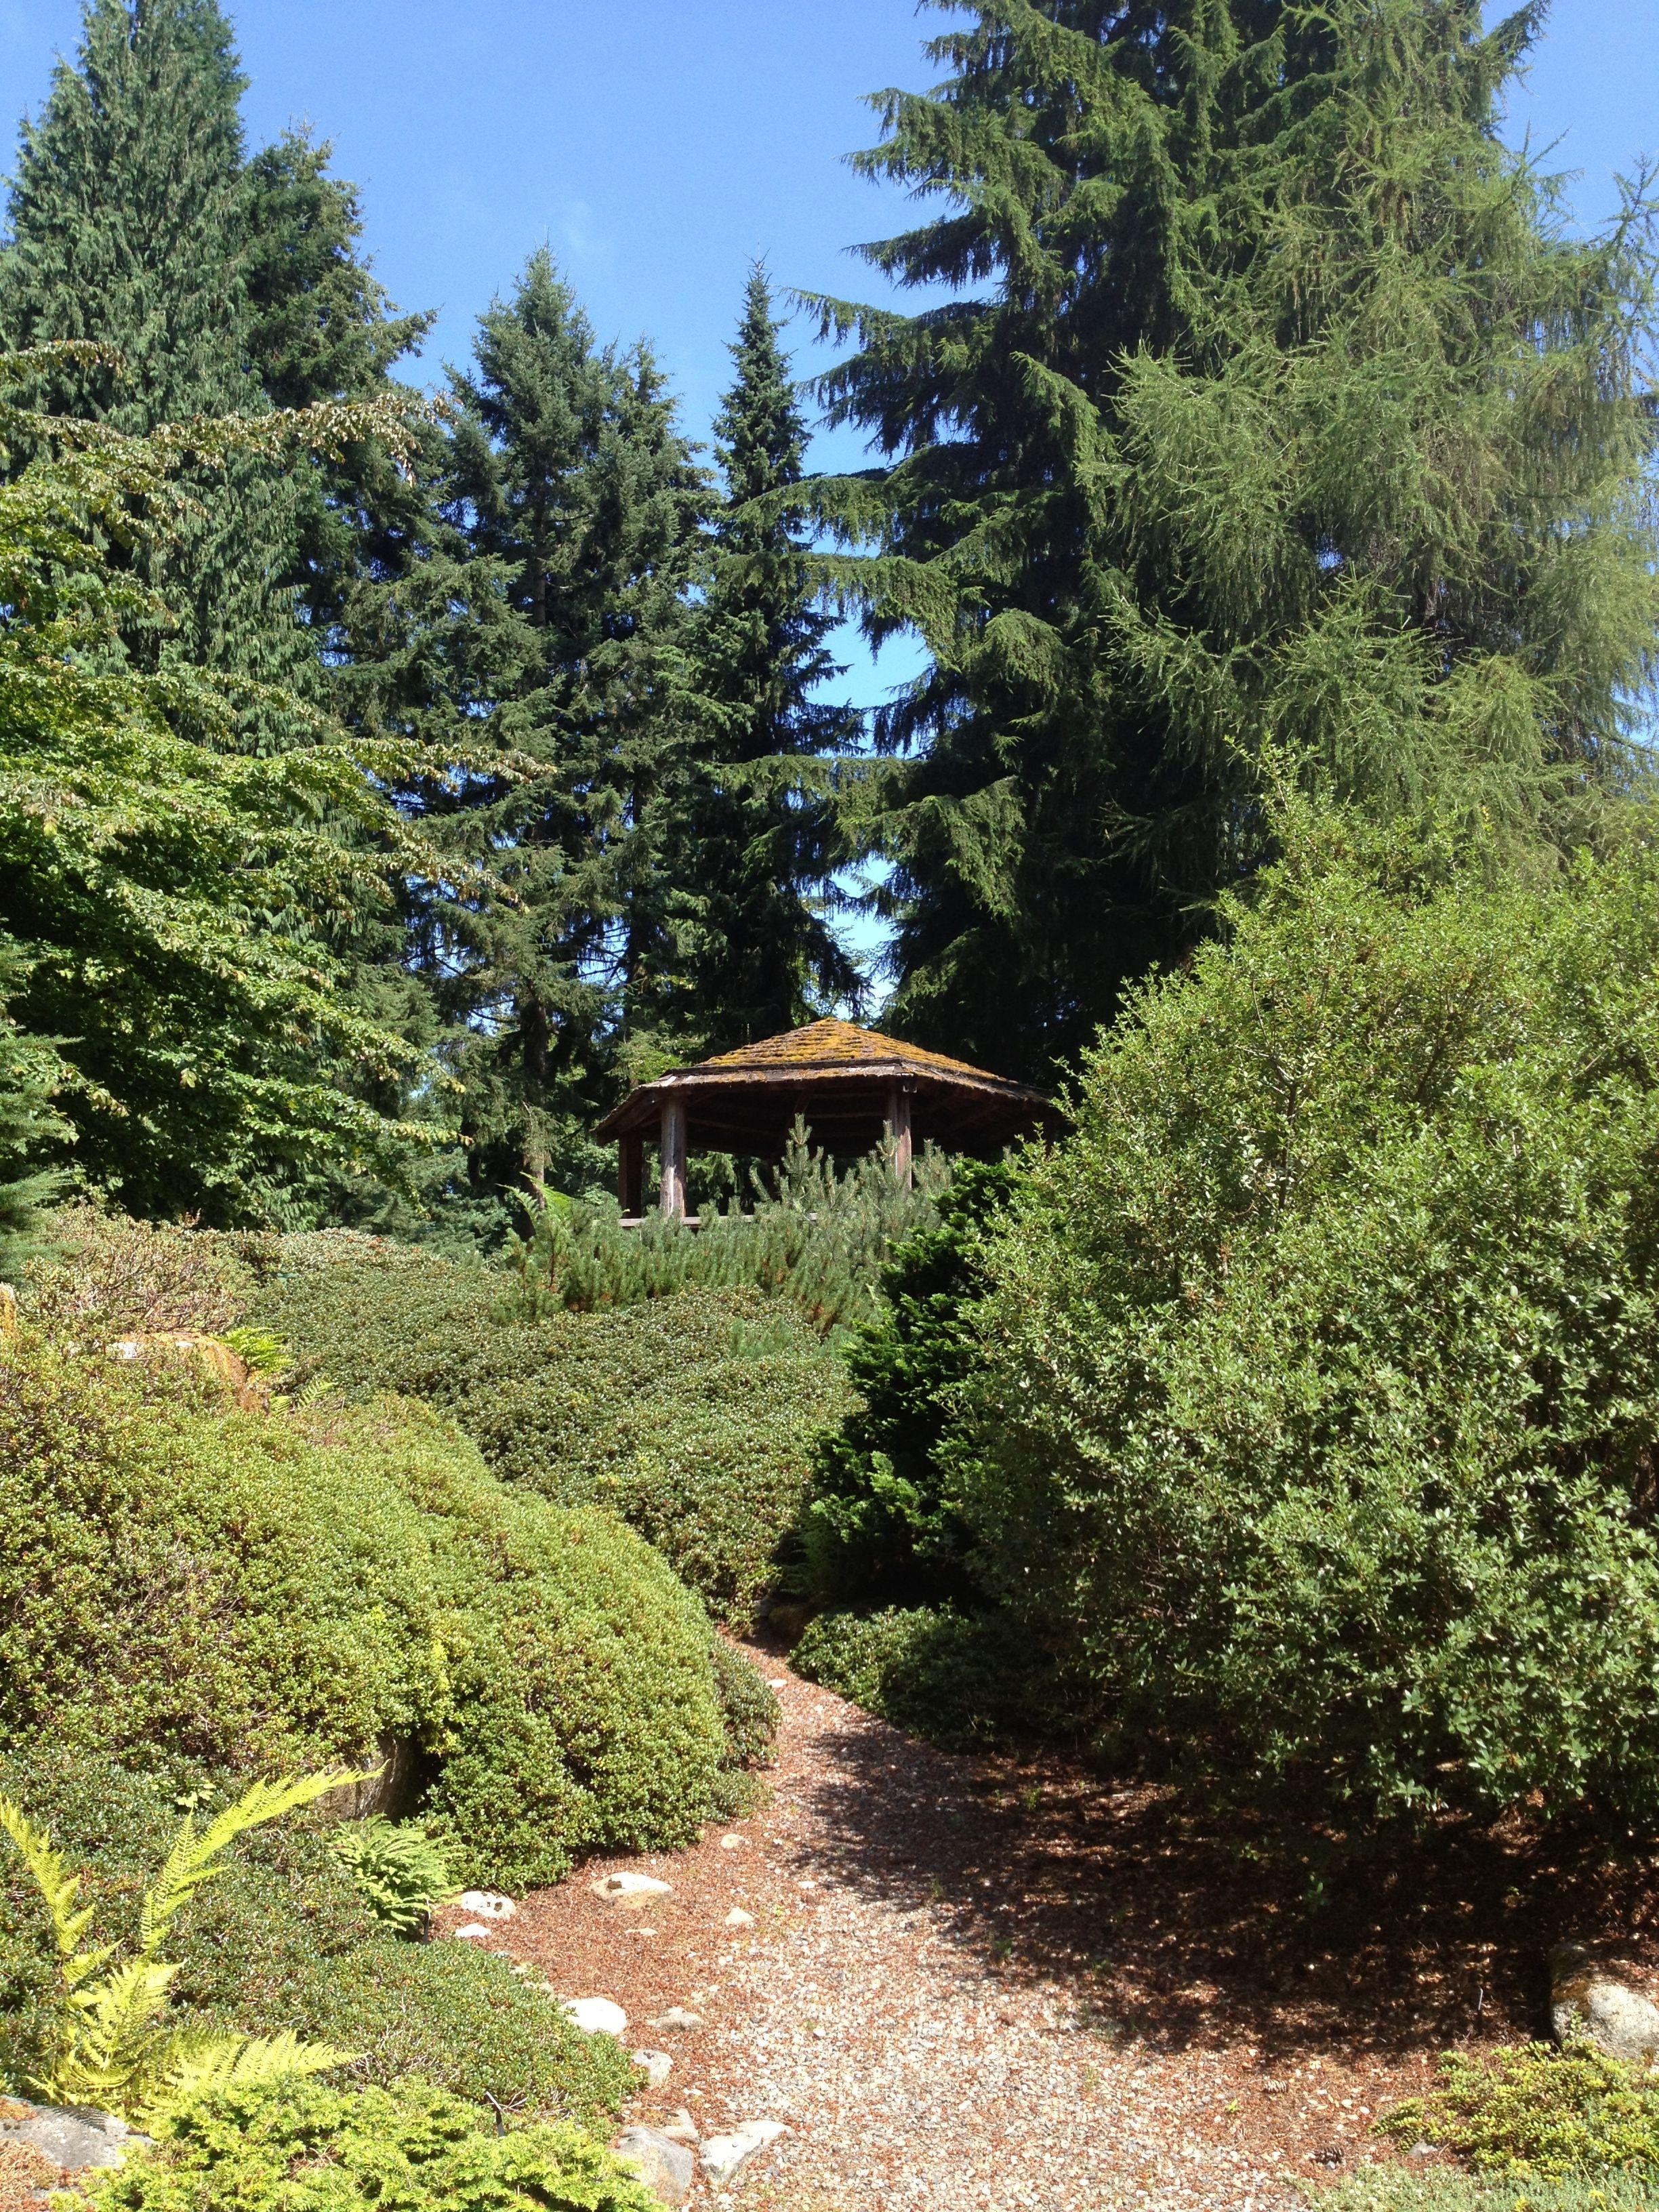 Bon Rhododendron Species Botanical Garden In Federal Way, Washington.